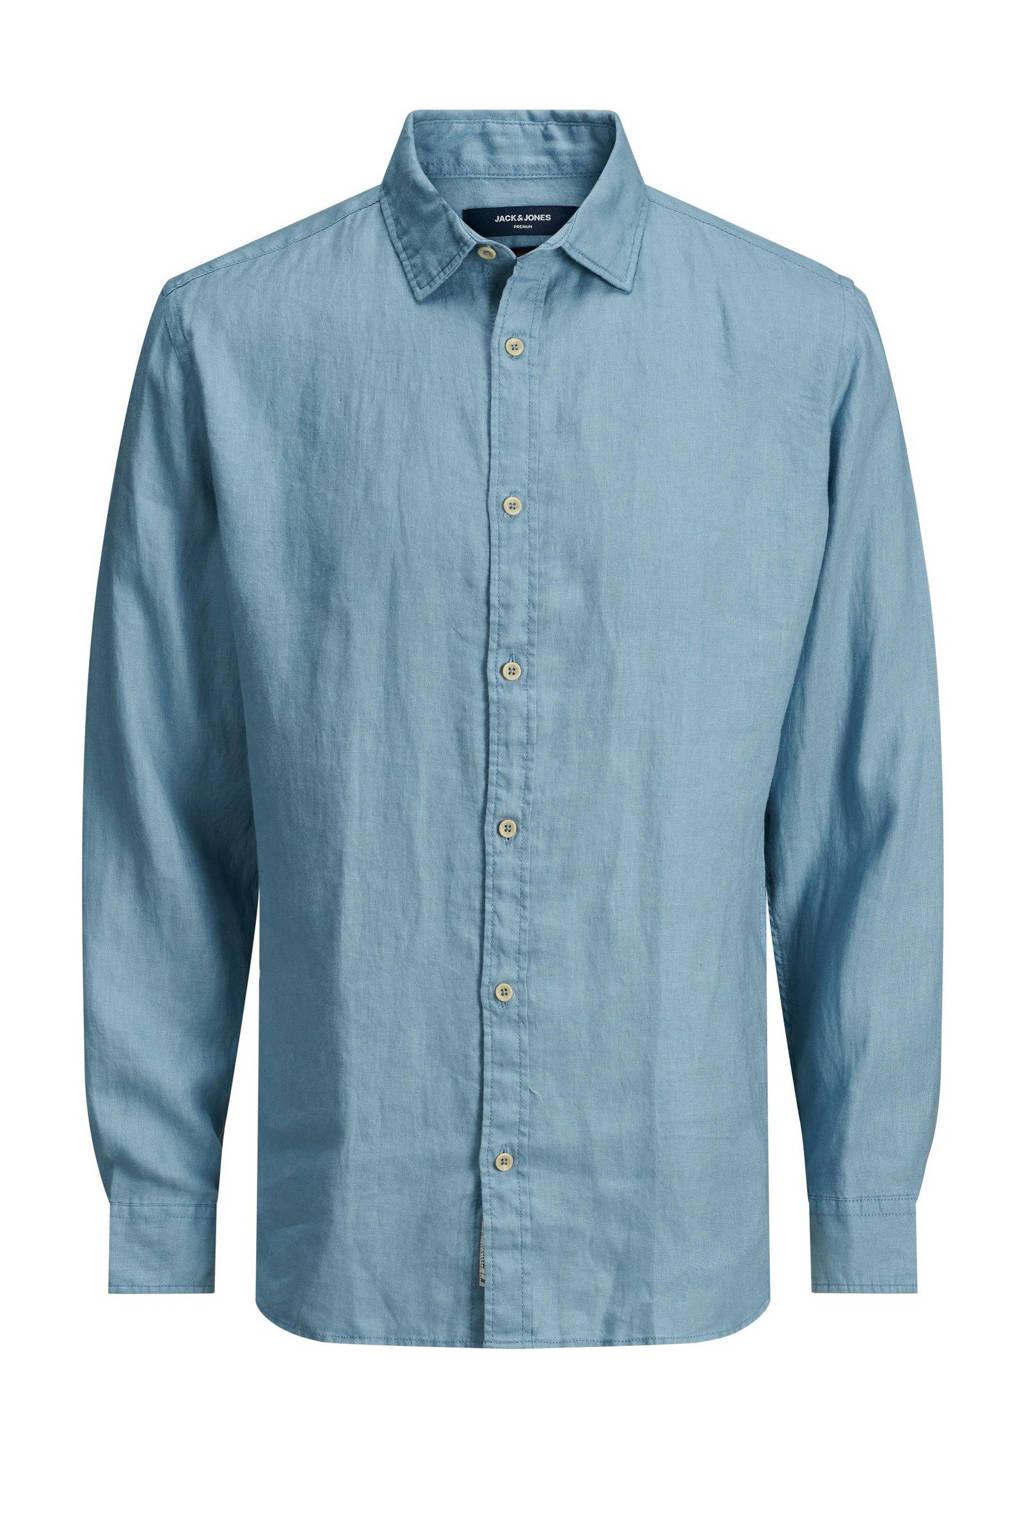 JACK & JONES PLUS SIZE regular fit overhemd Plus Size blauw, Blauw